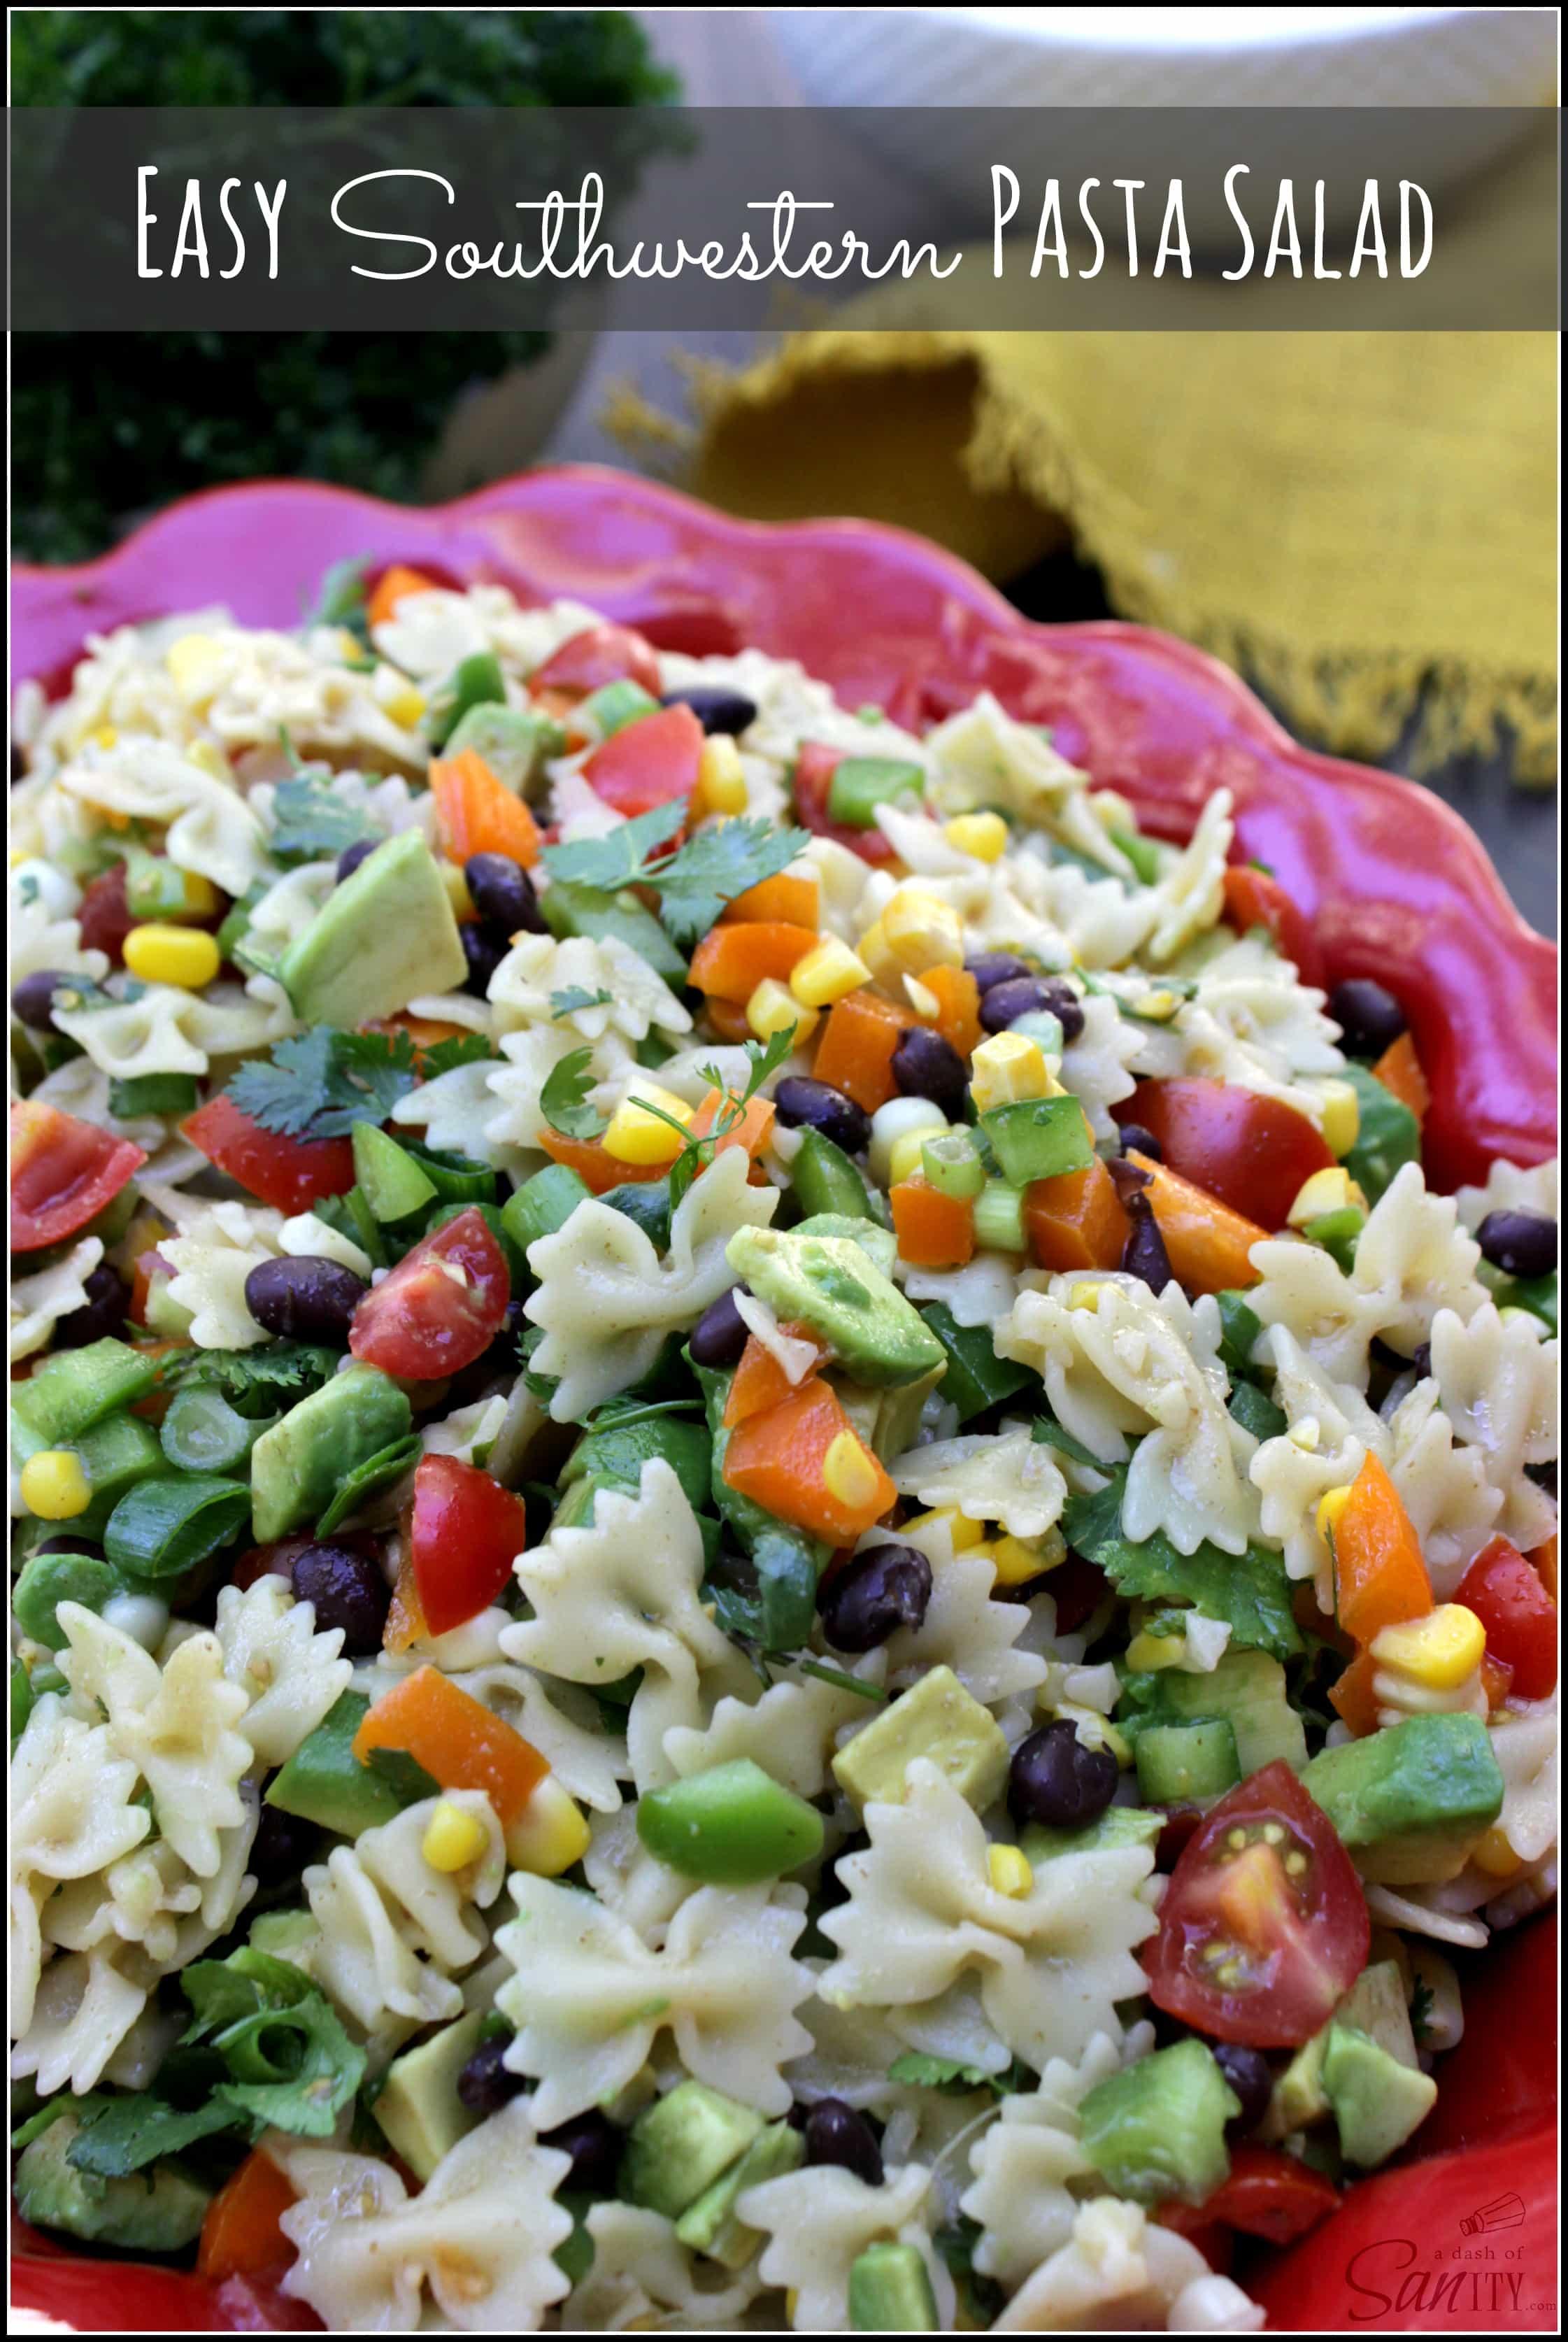 Easy Southwestern Pasta Salad